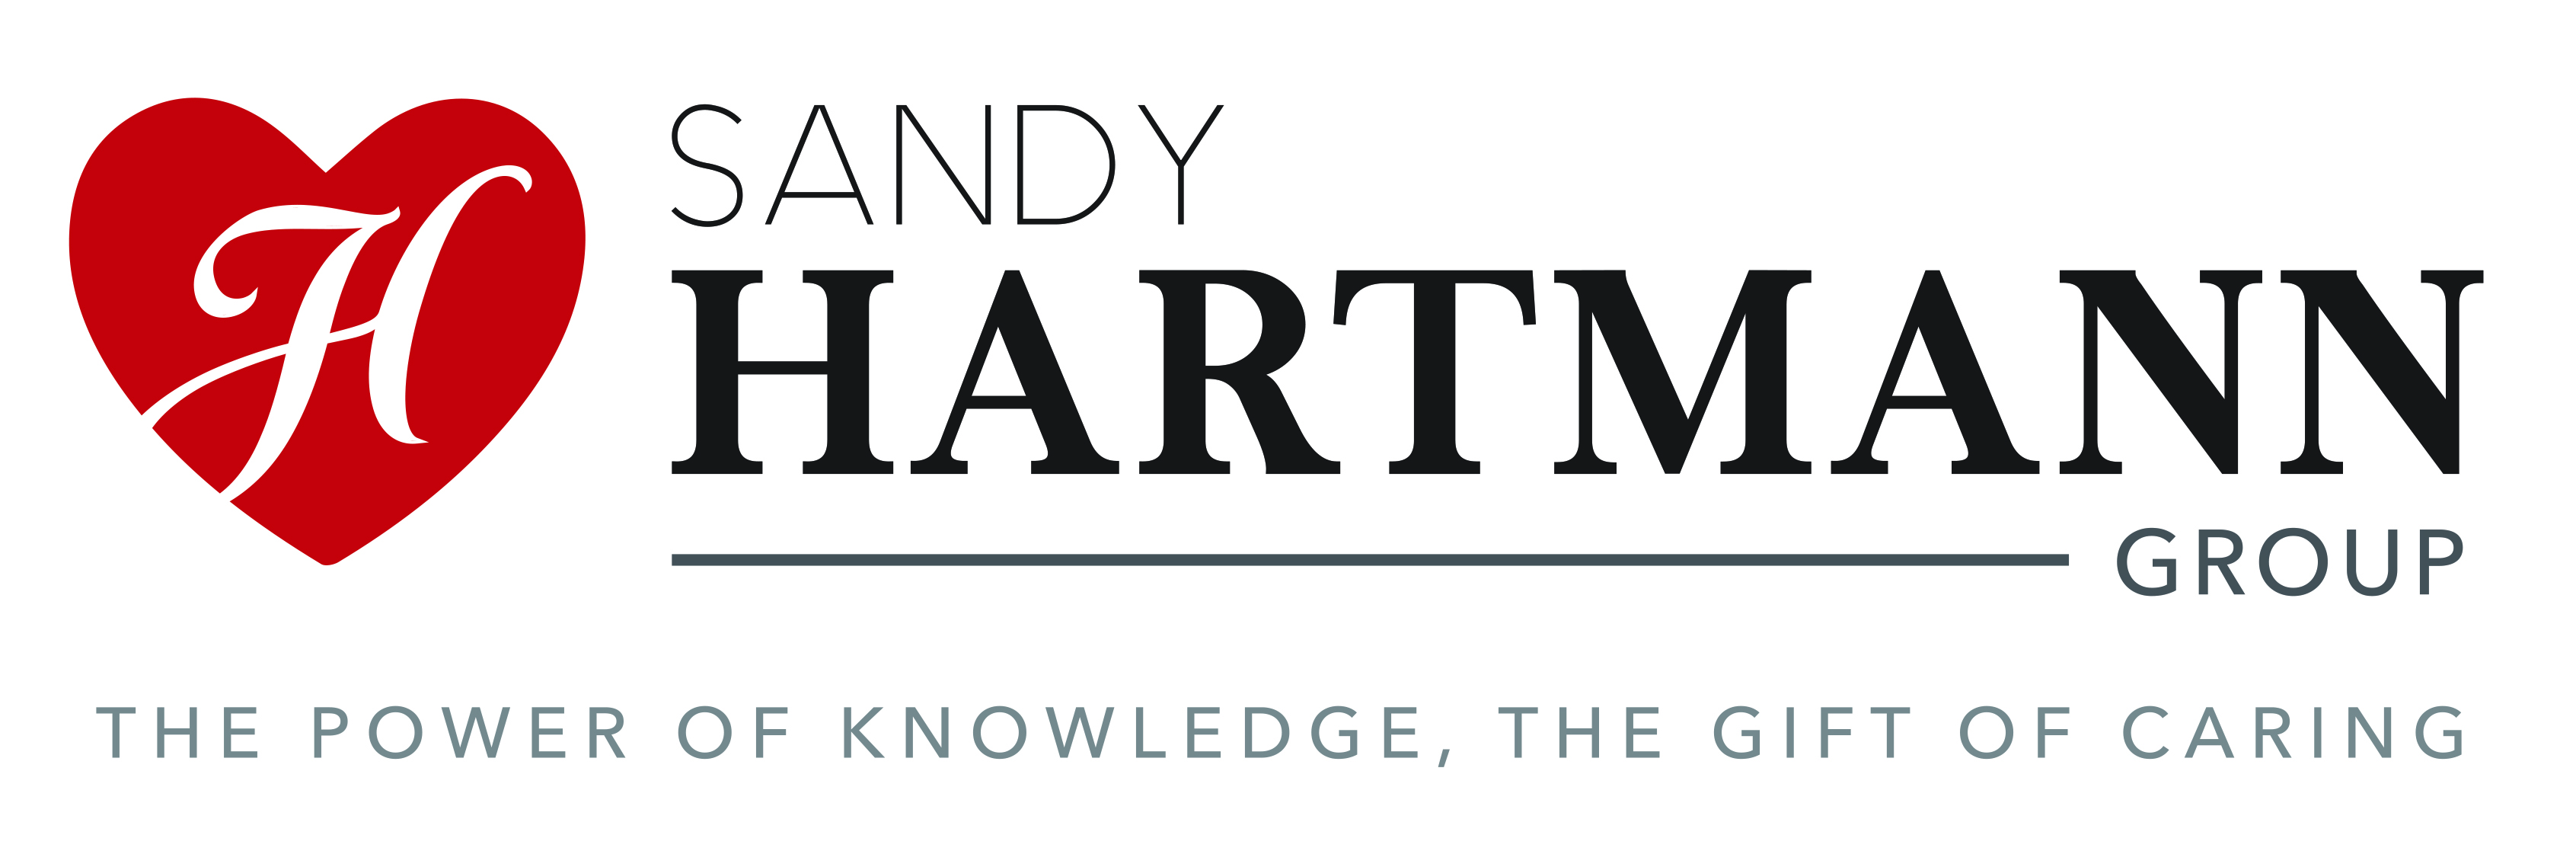 Sandy Hartmann Group Logo for True 3D Virtual Tour